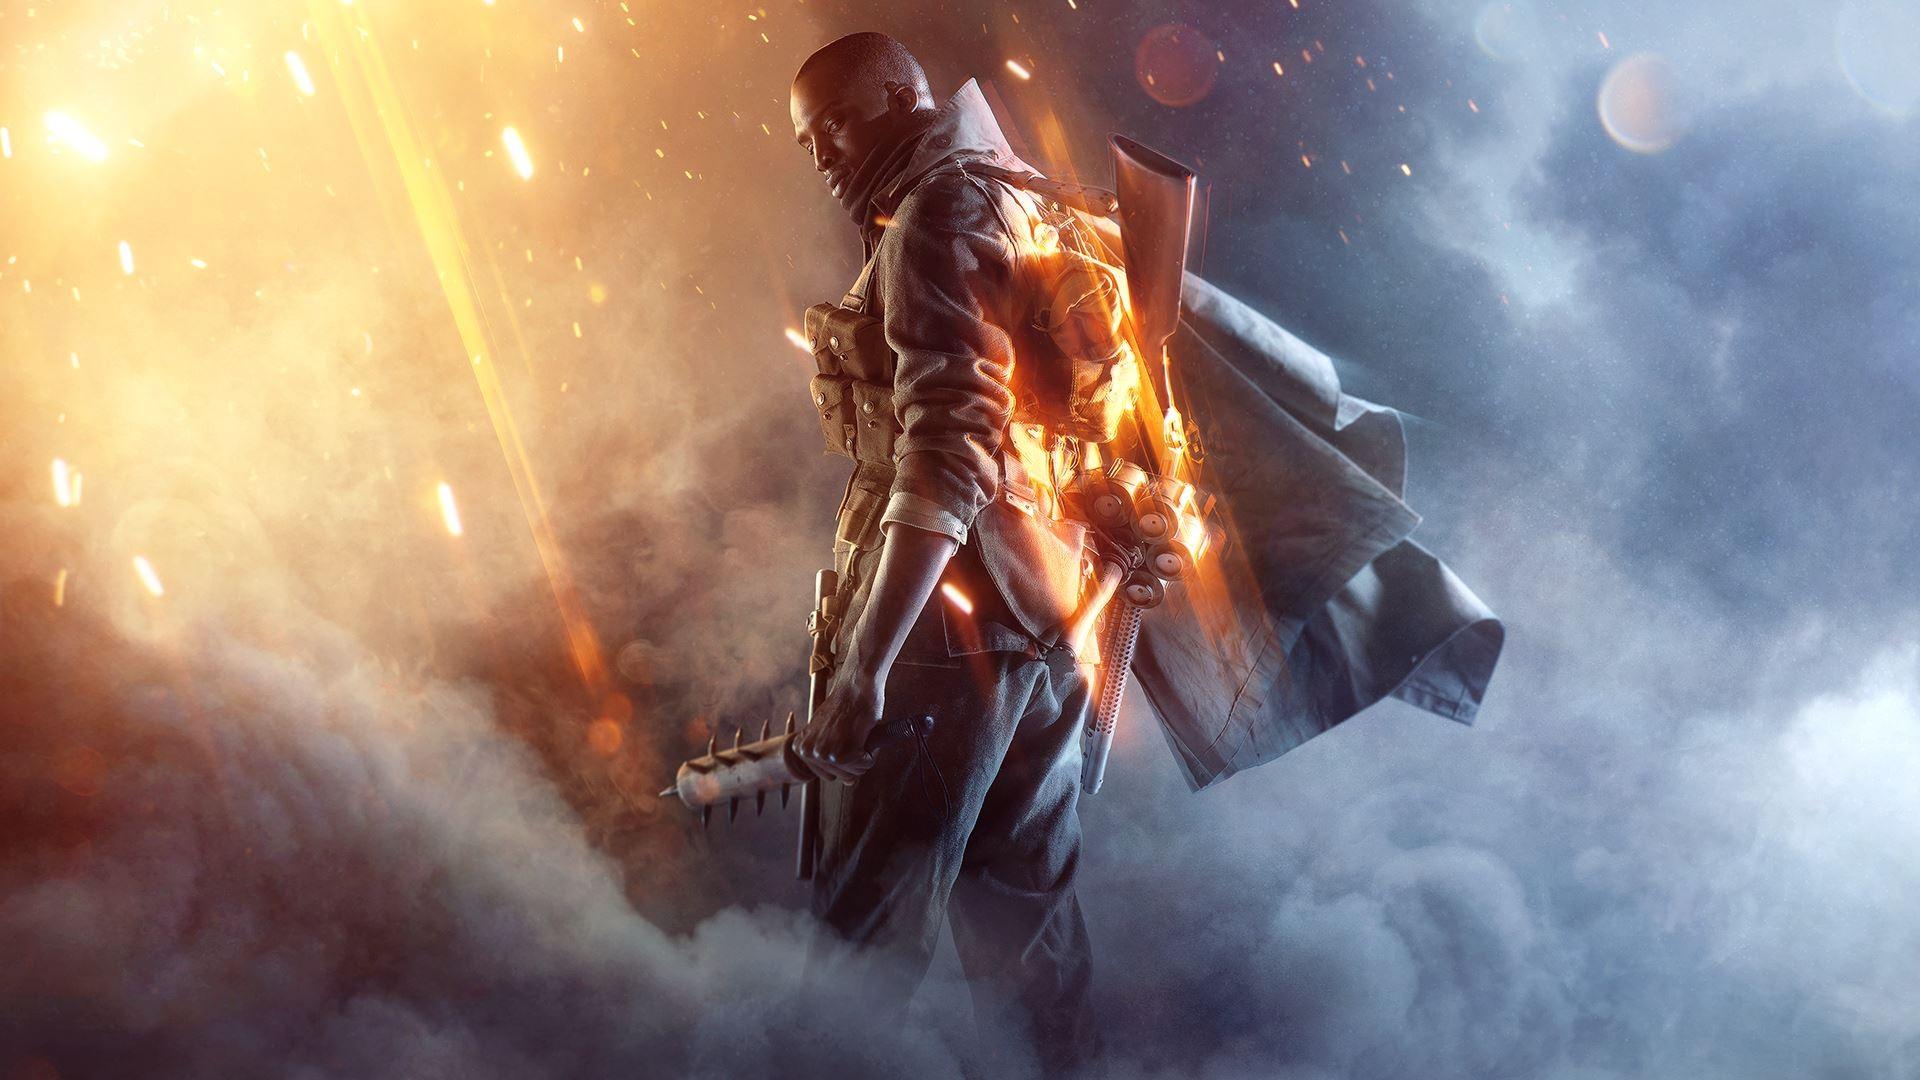 Wallpaper Battlefield 1, Squads, 2016 Games, 4K, 8K, Games, #878